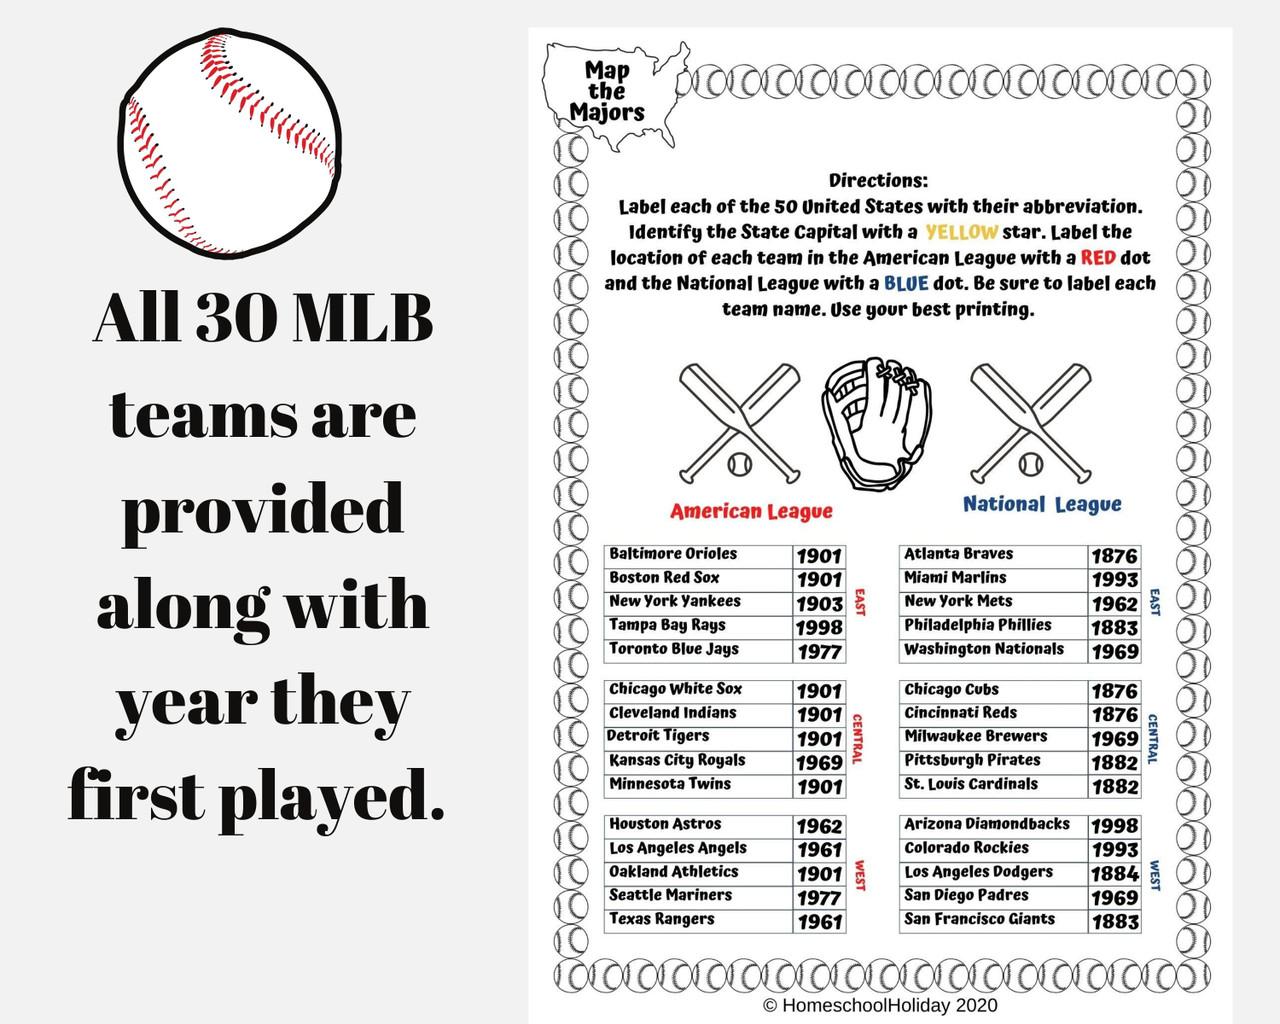 Map Major League Baseball Teams & State Capitals - Hump Day Sale